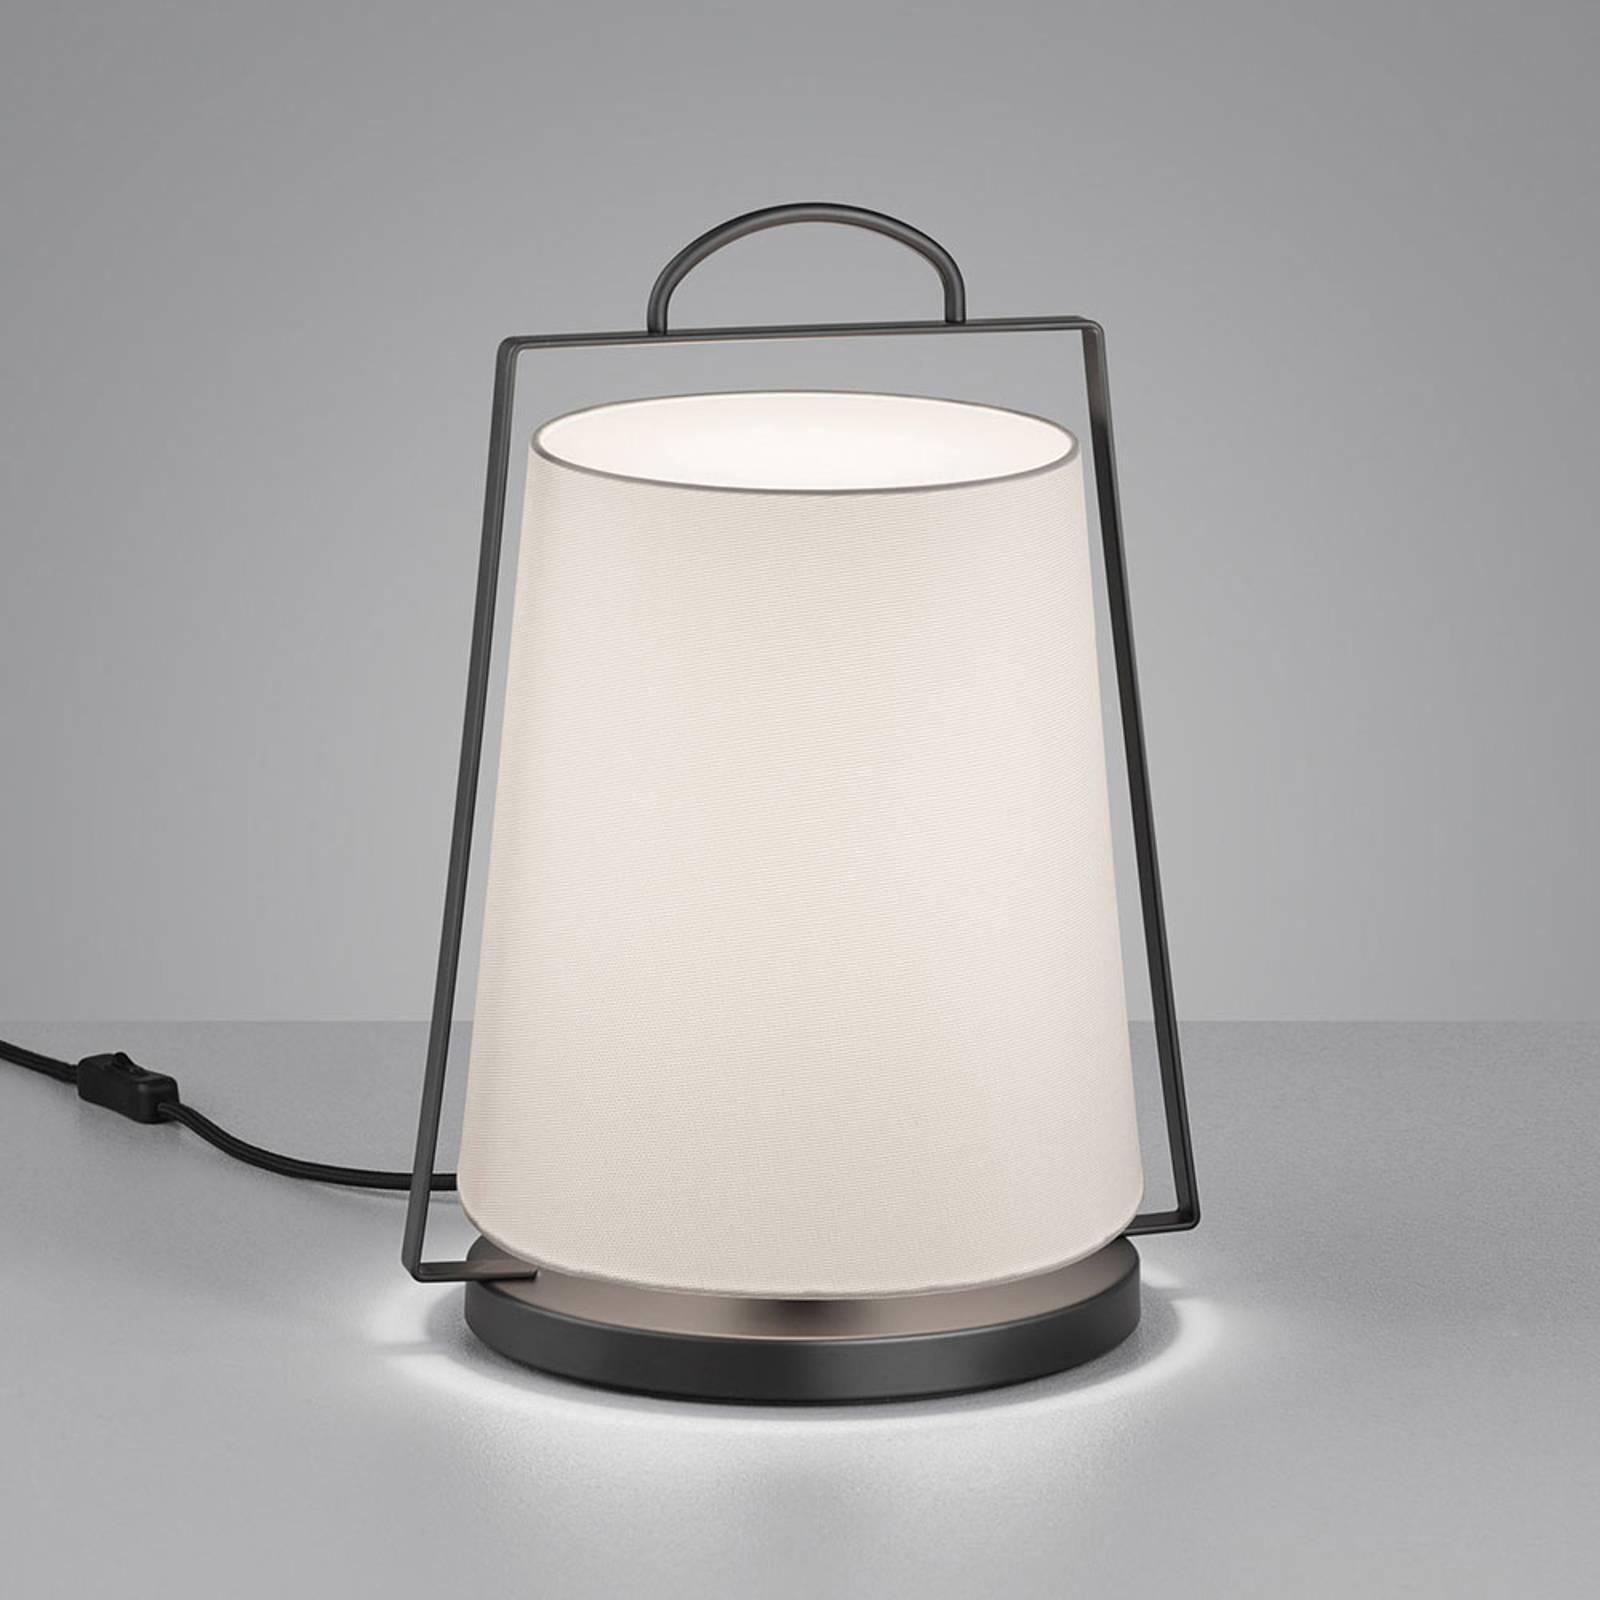 Helestra Uka lampe à poser abat-jour tissu blanc